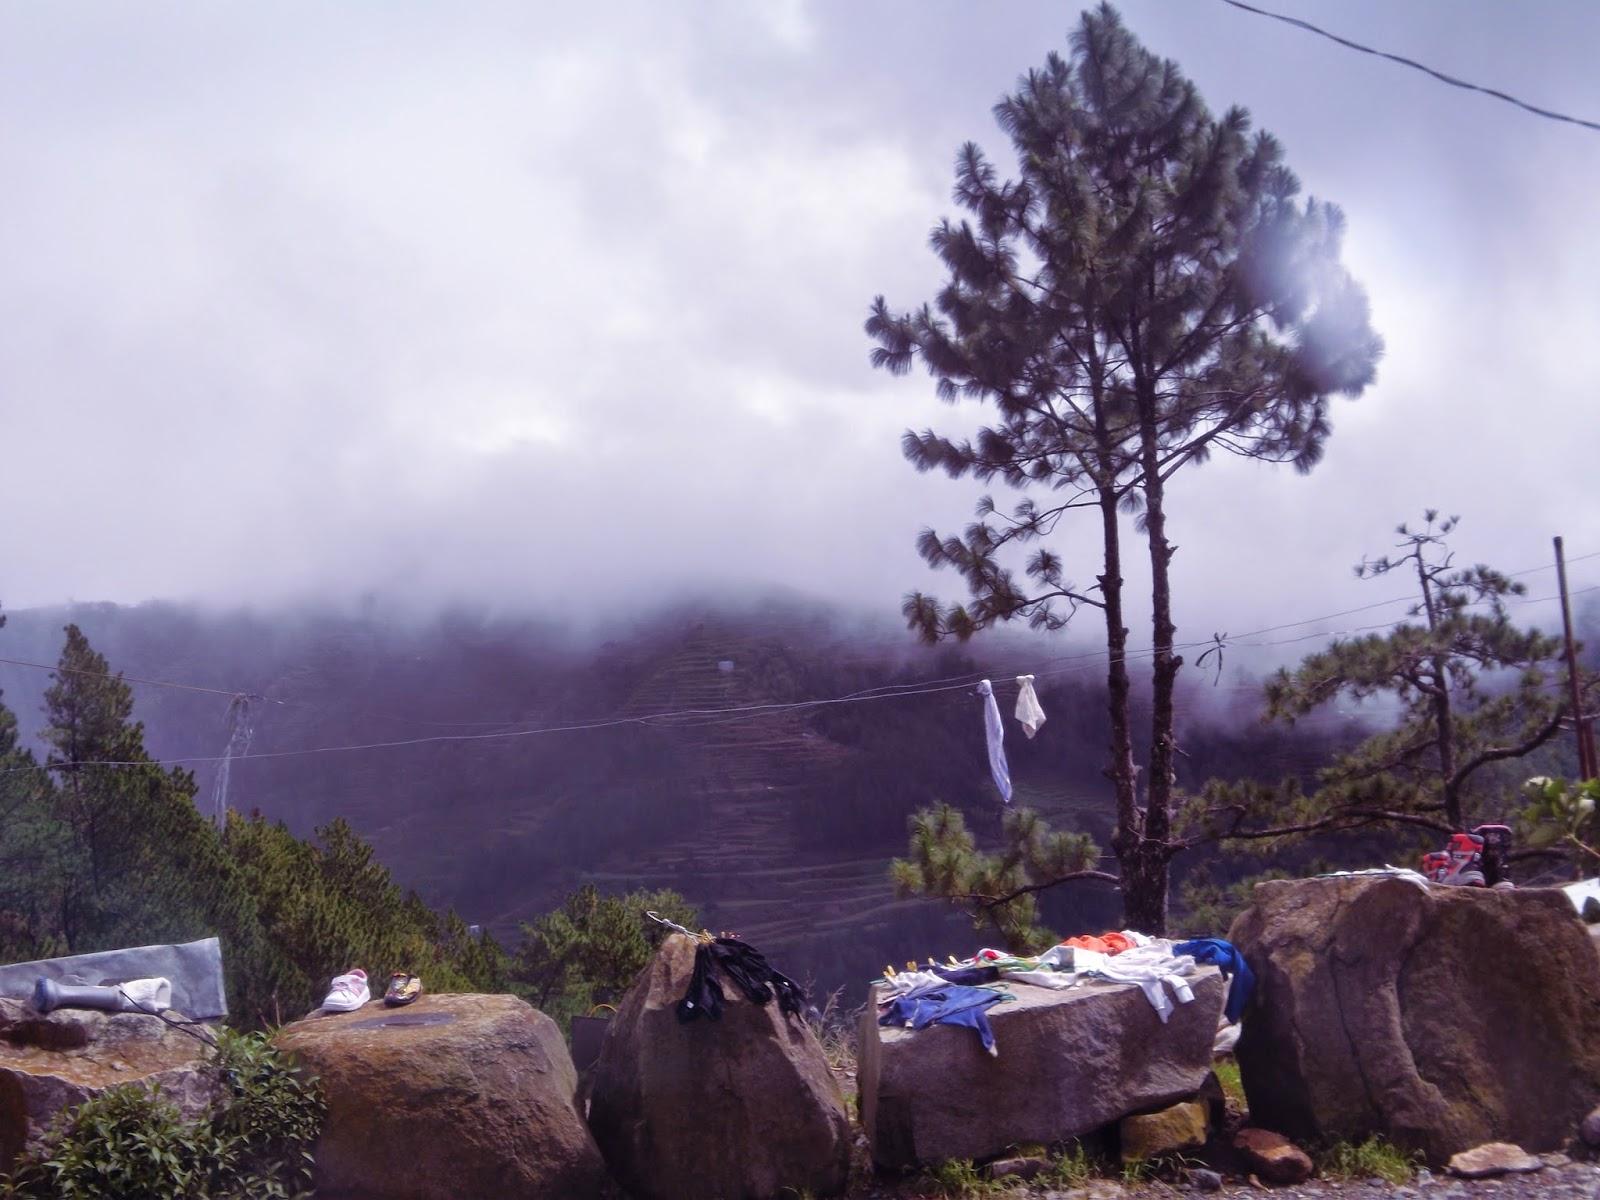 Mt. Province Philippines